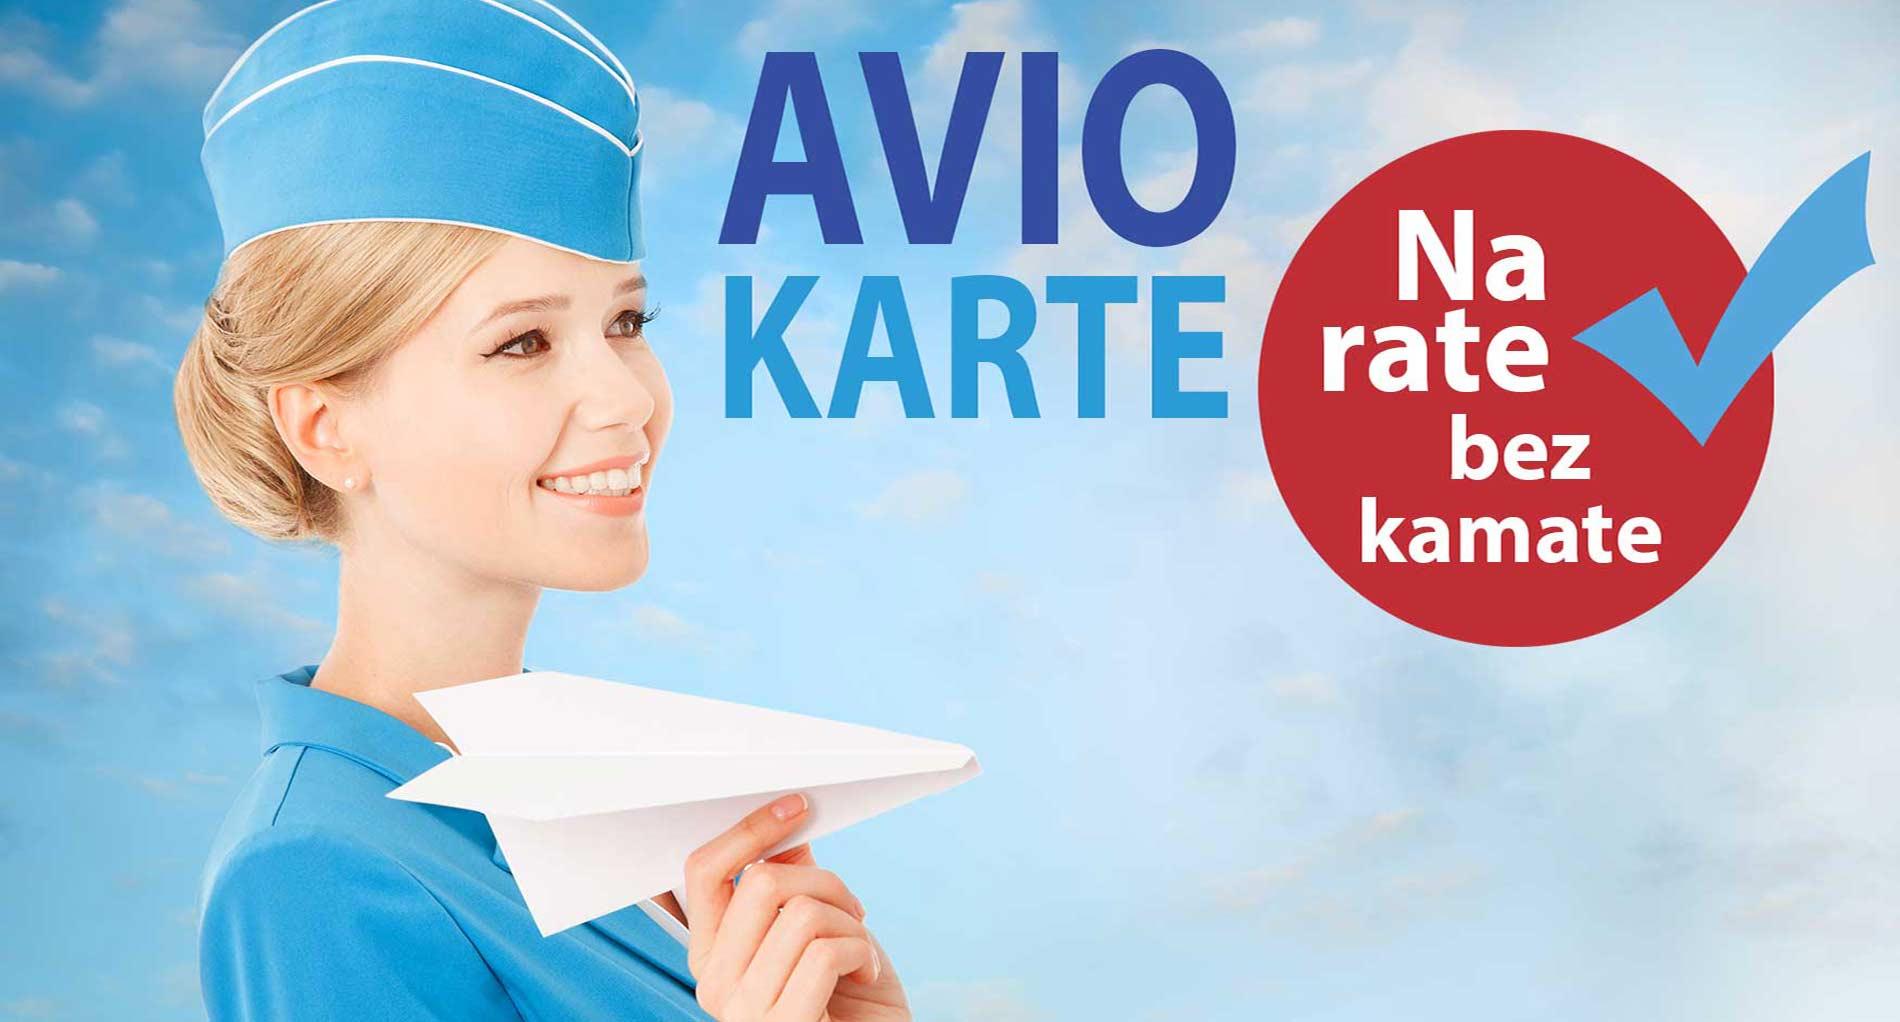 avio-karte-na-rate1